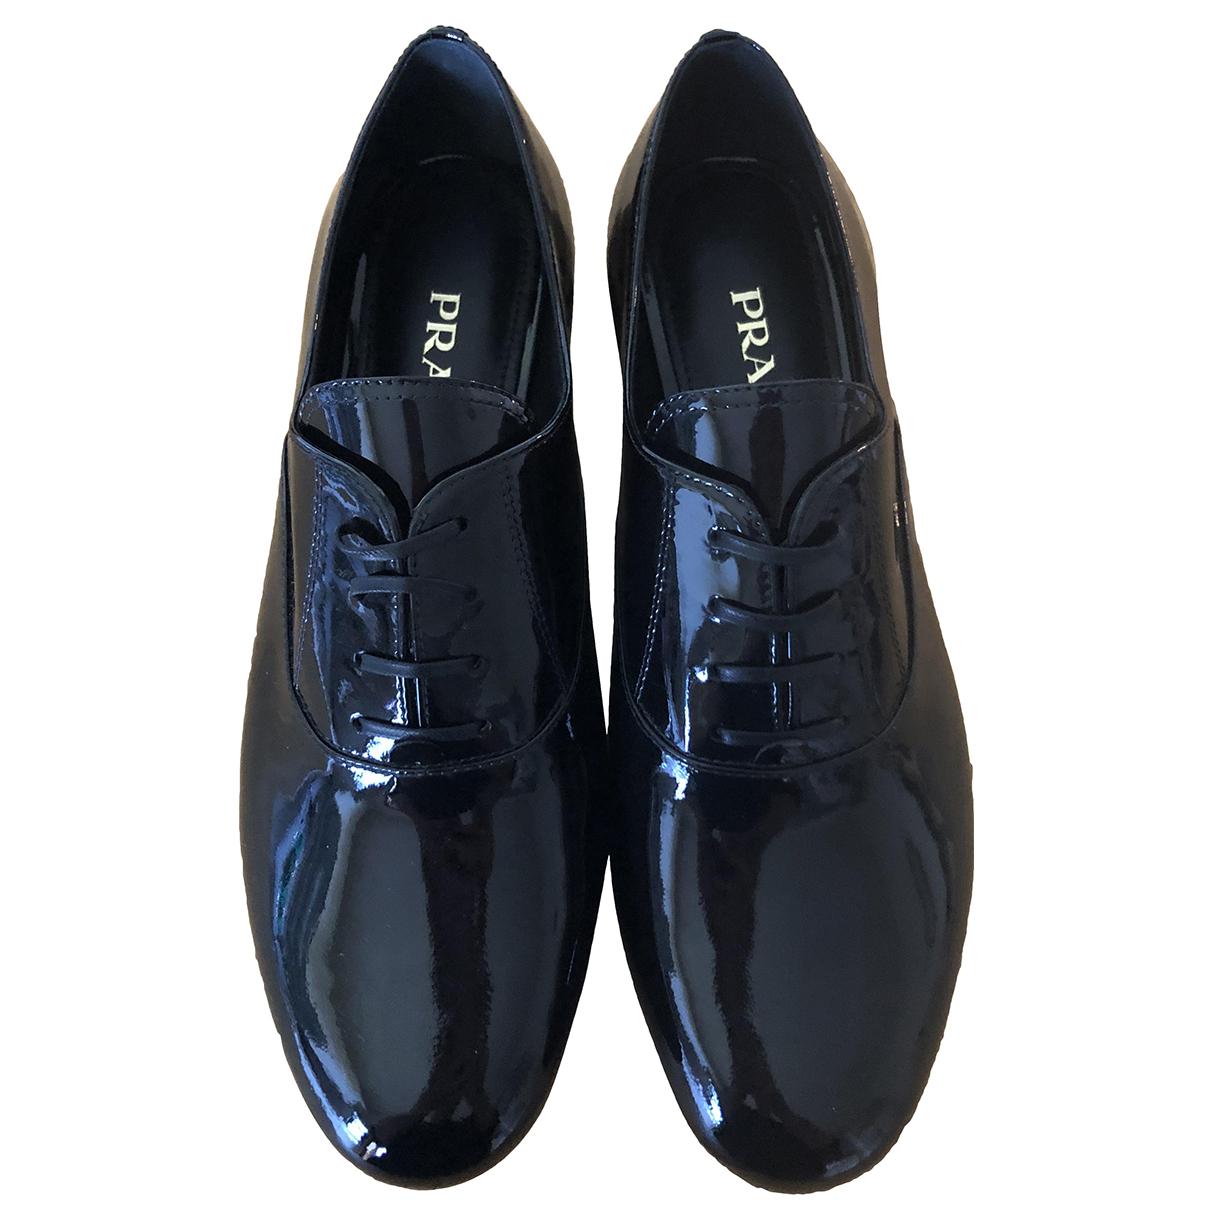 Prada N Black Patent leather Lace ups for Women 37.5 EU